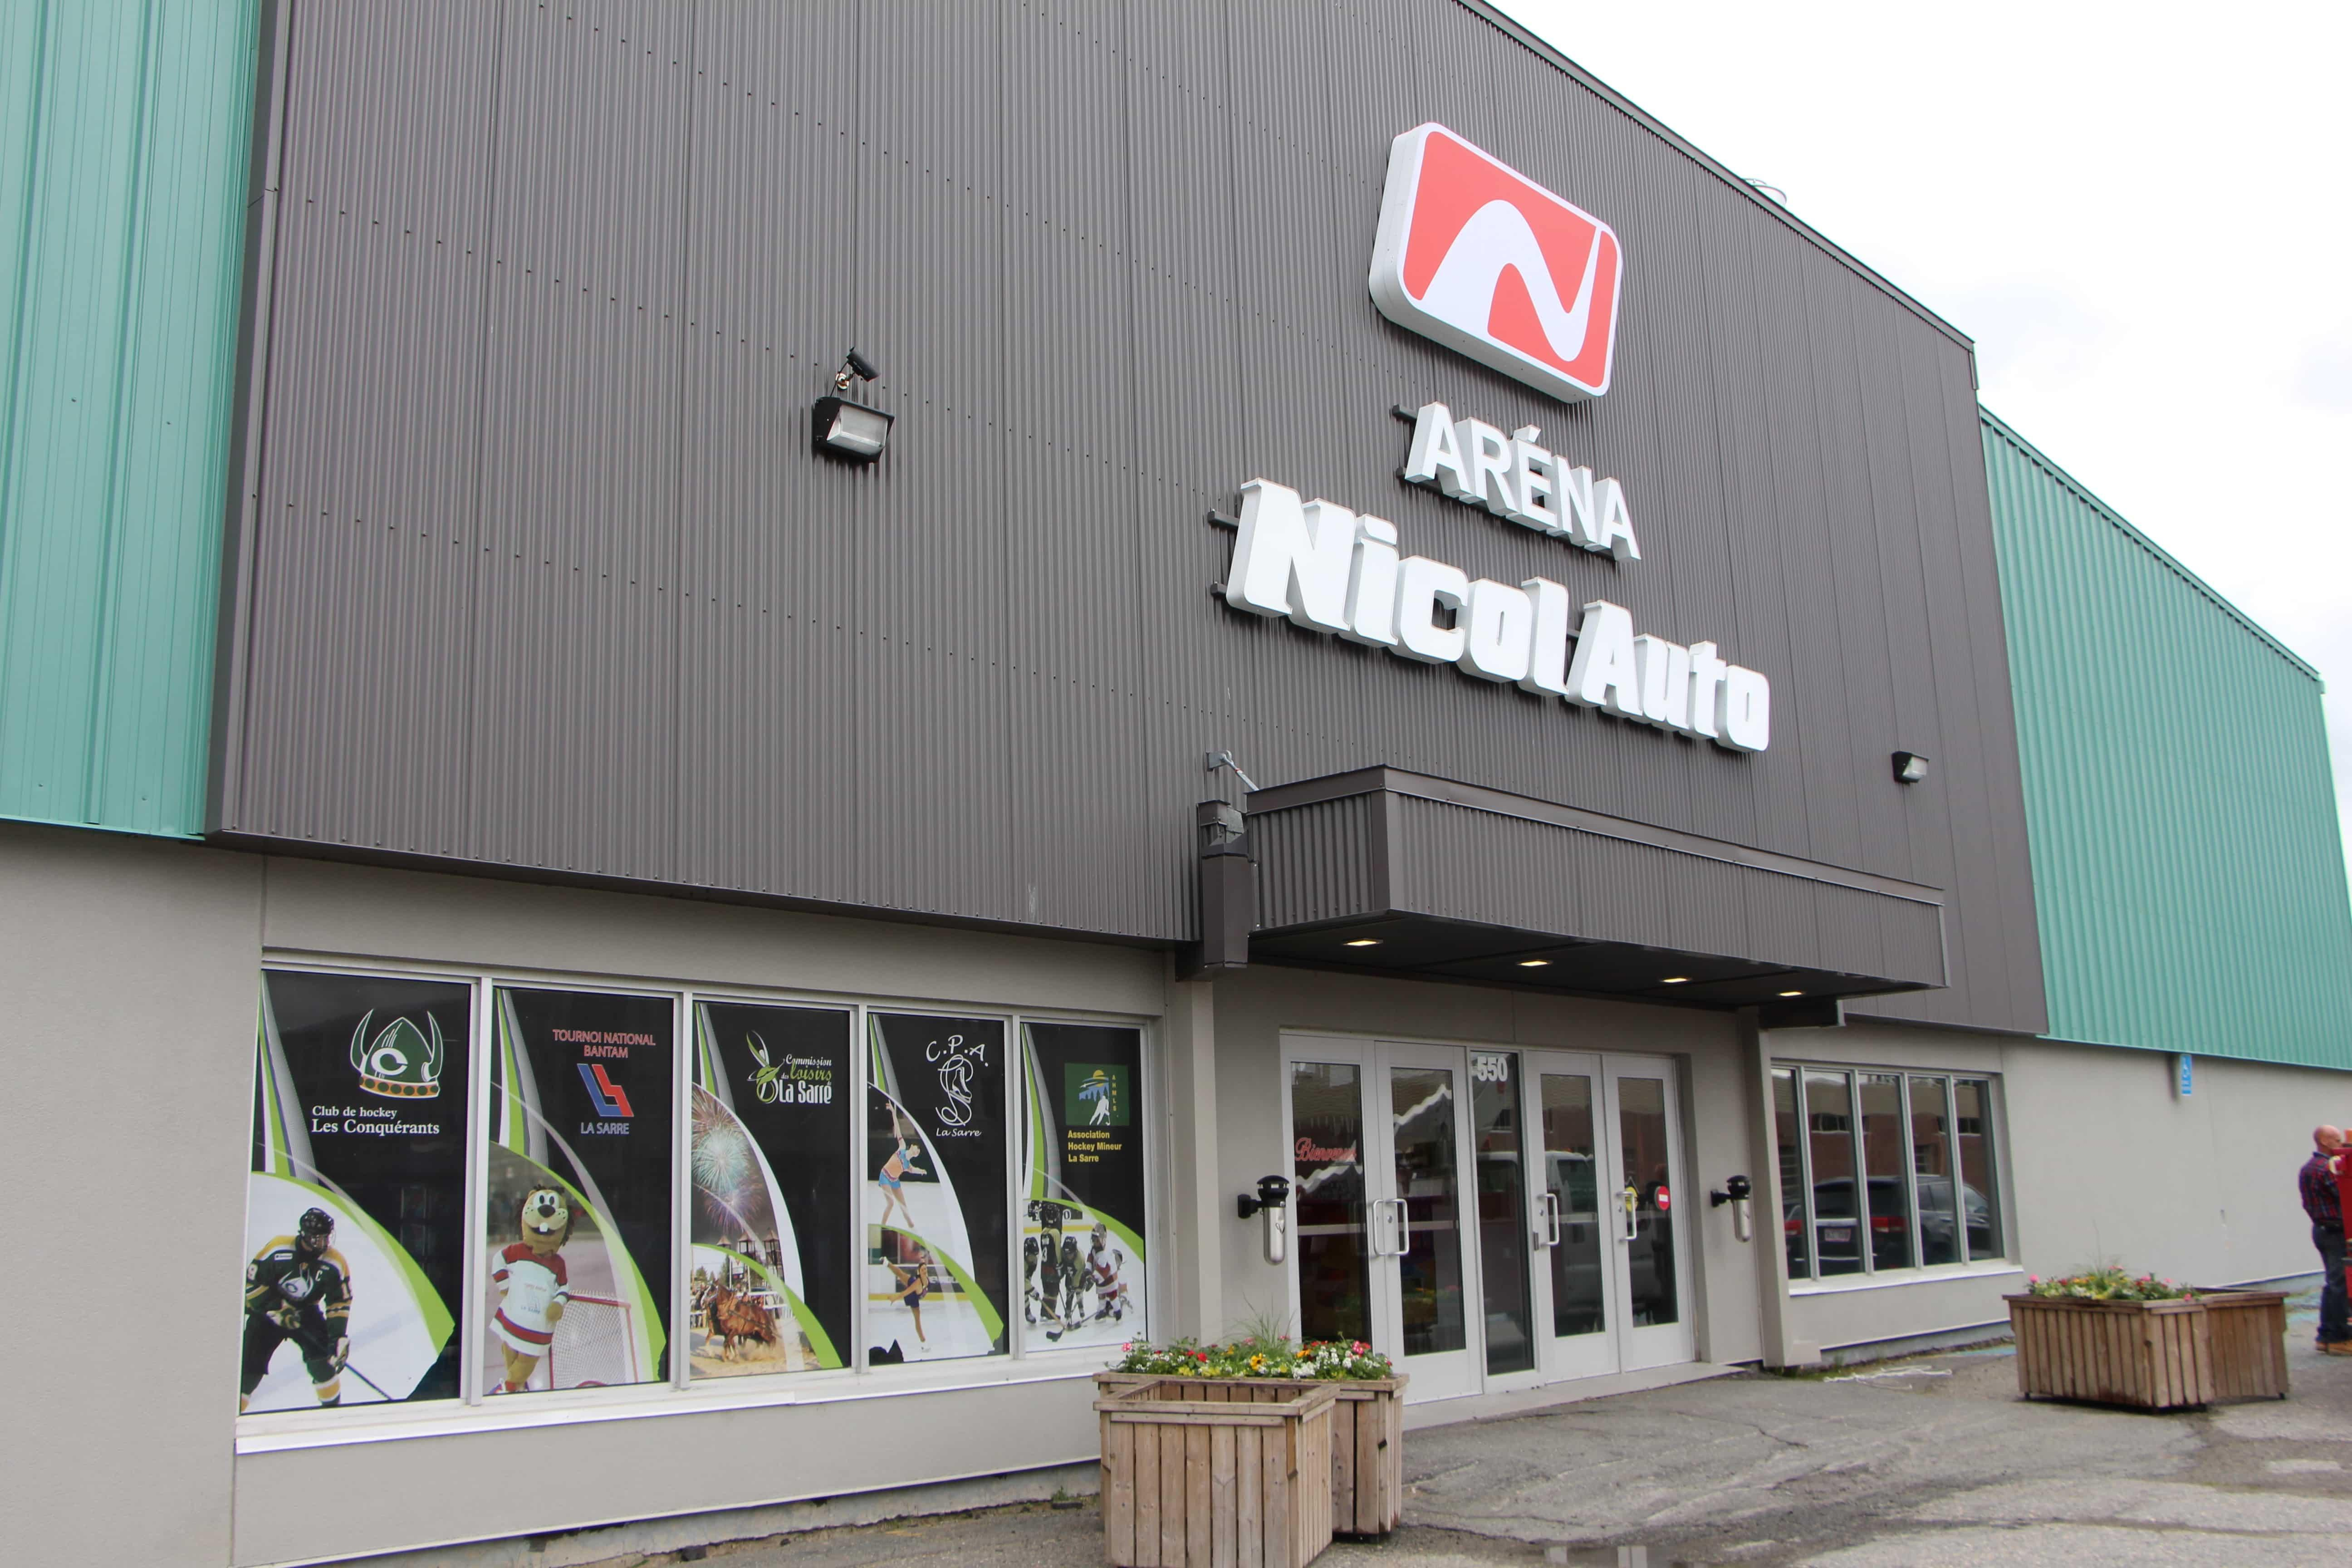 Arena-Nicol-Auto-La-Sarre